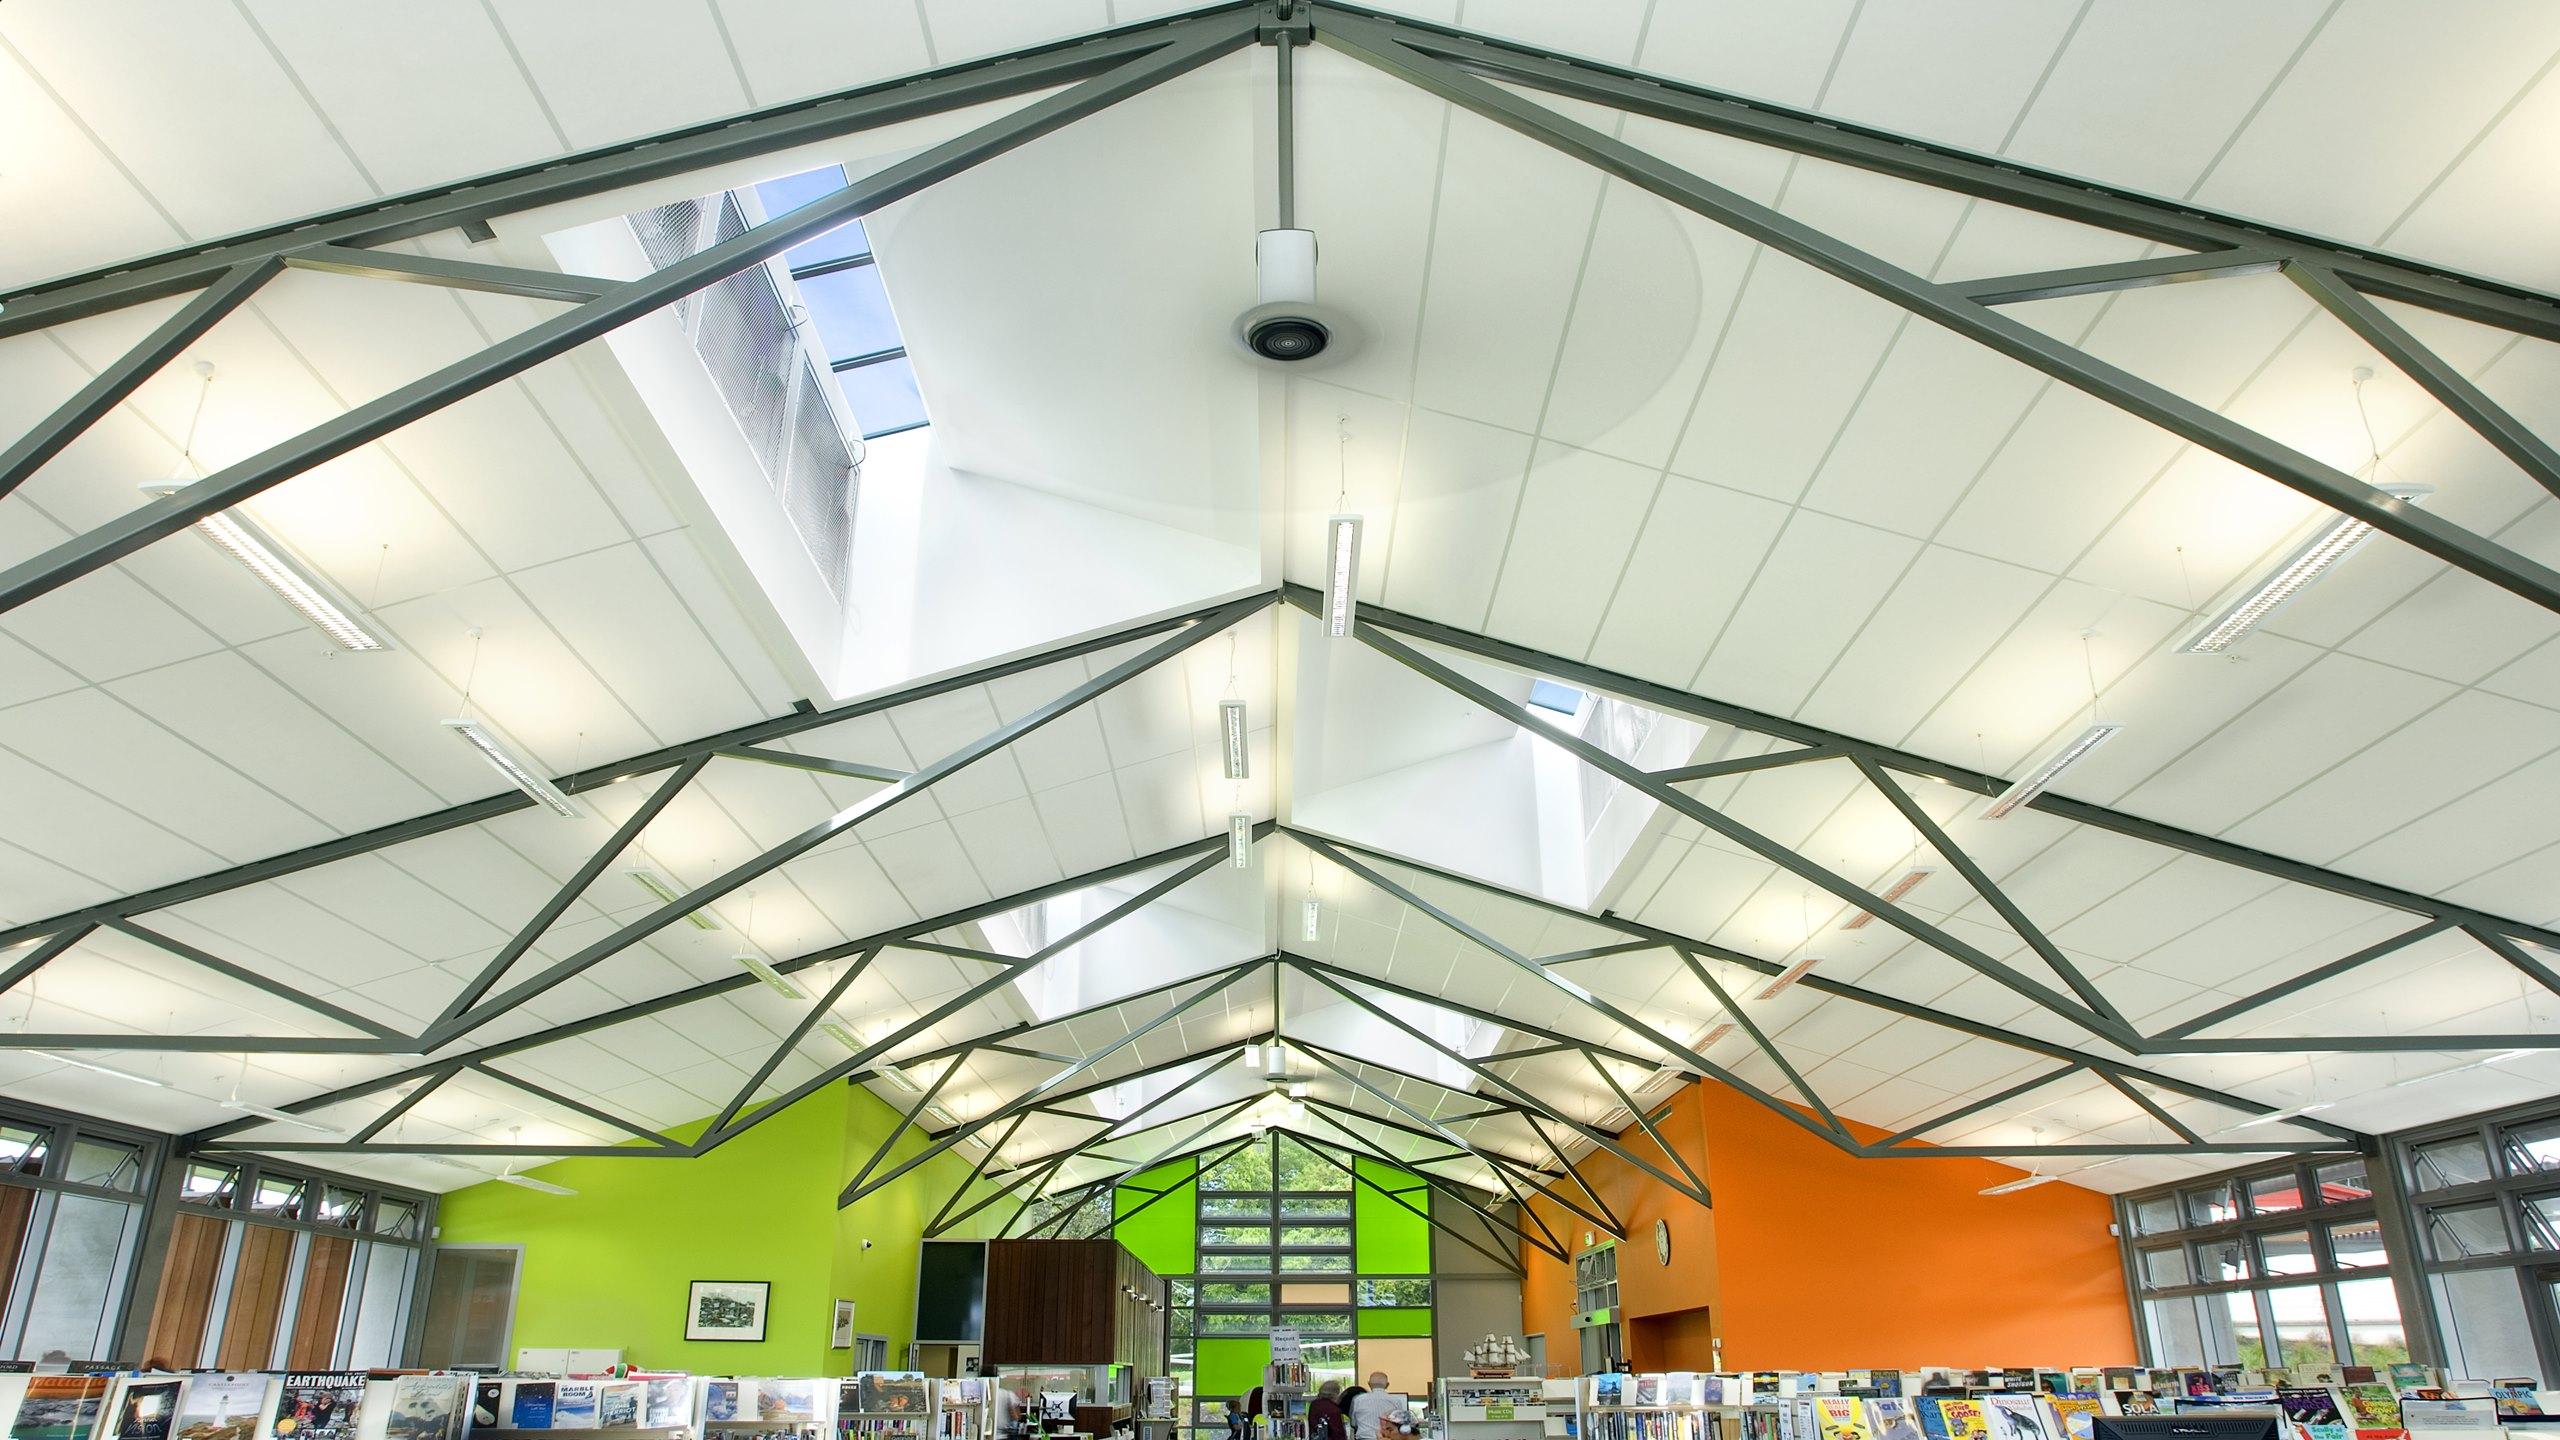 Wellsford Memorial Library - Triton 25